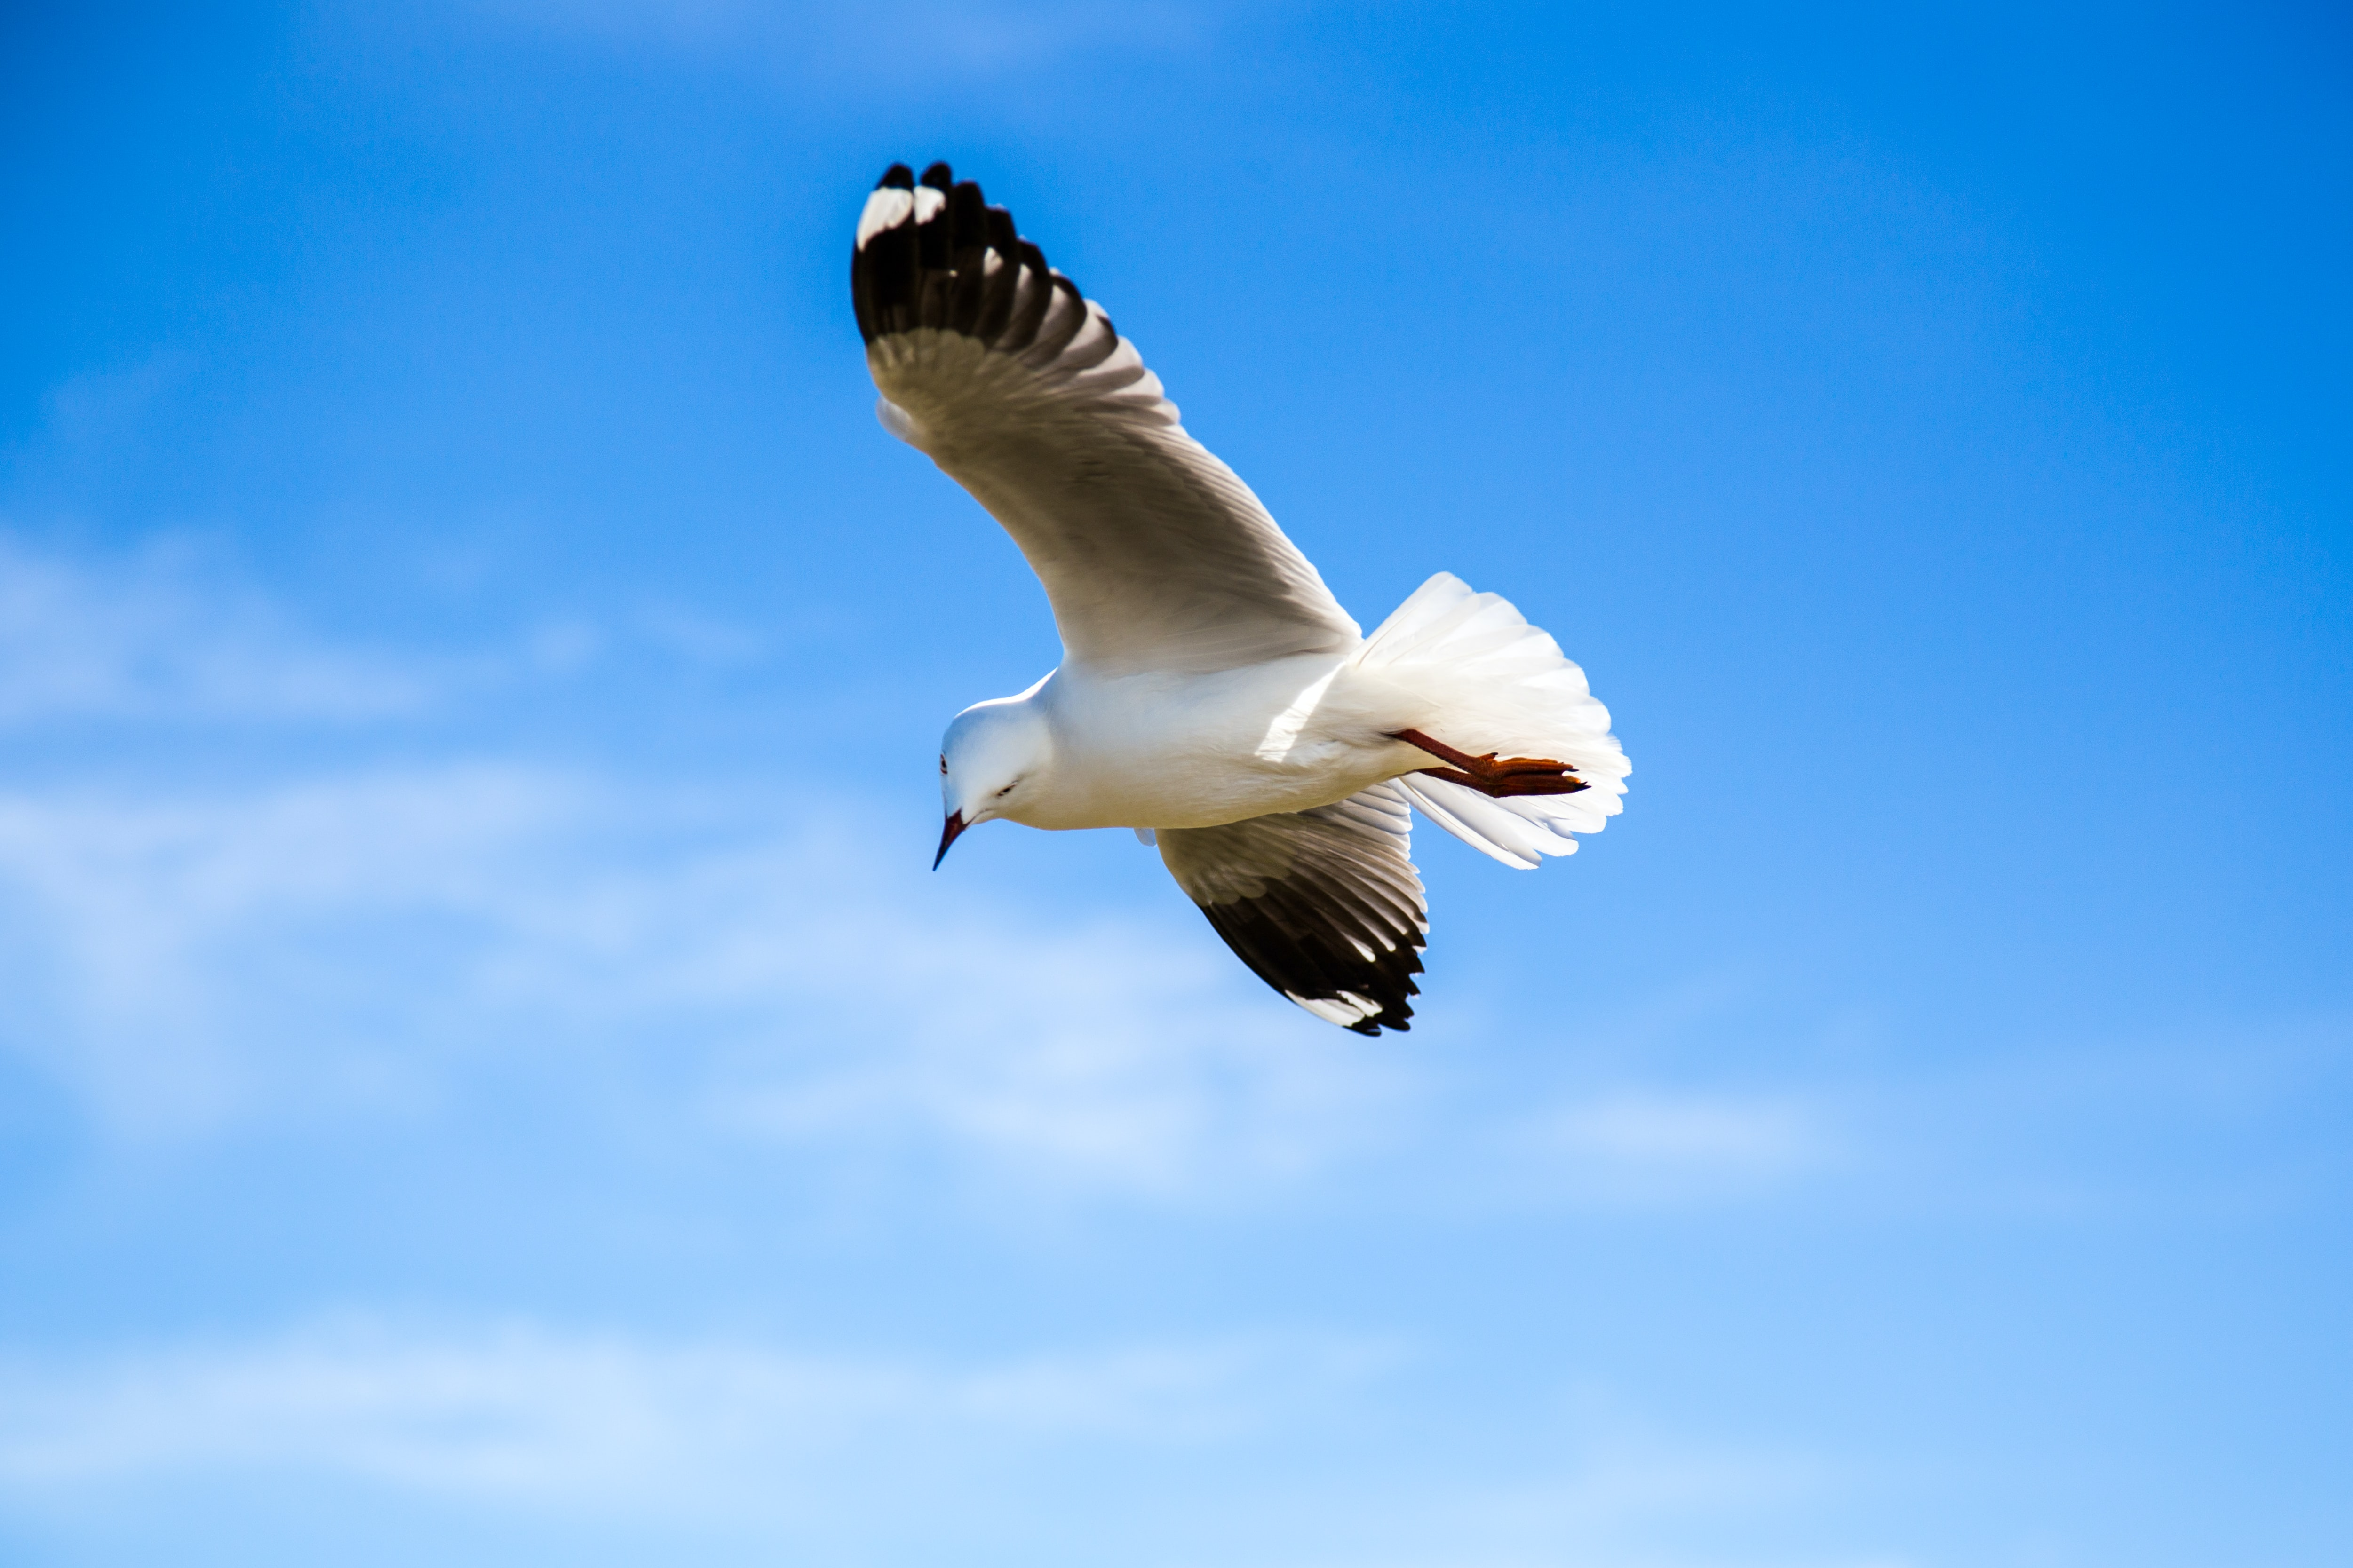 black and white bird flying under blue sky